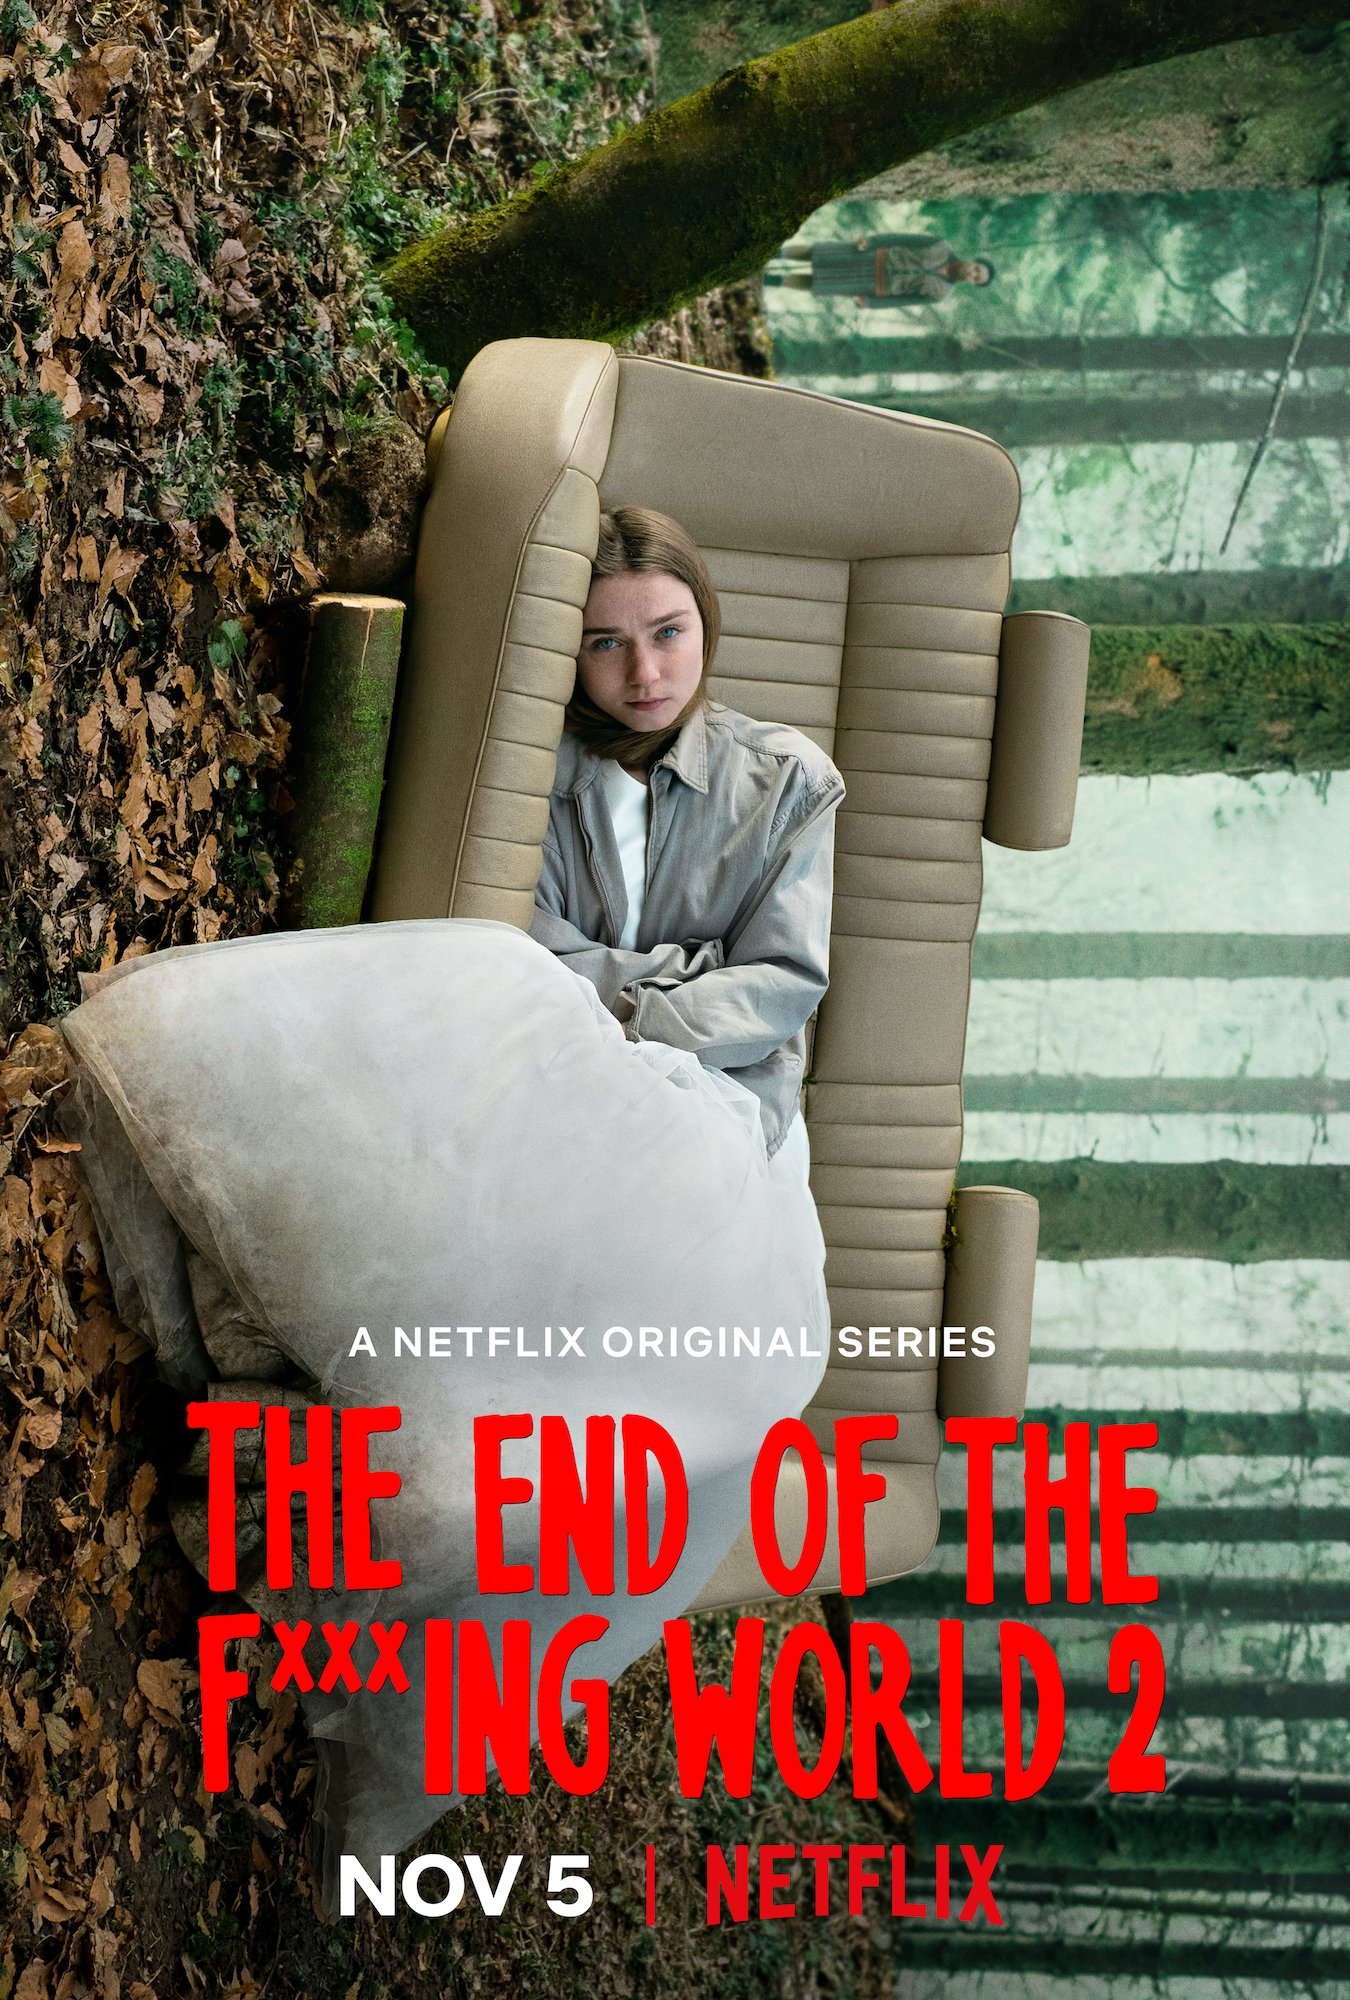 'The End of the F**king World' key art. [Netflix]